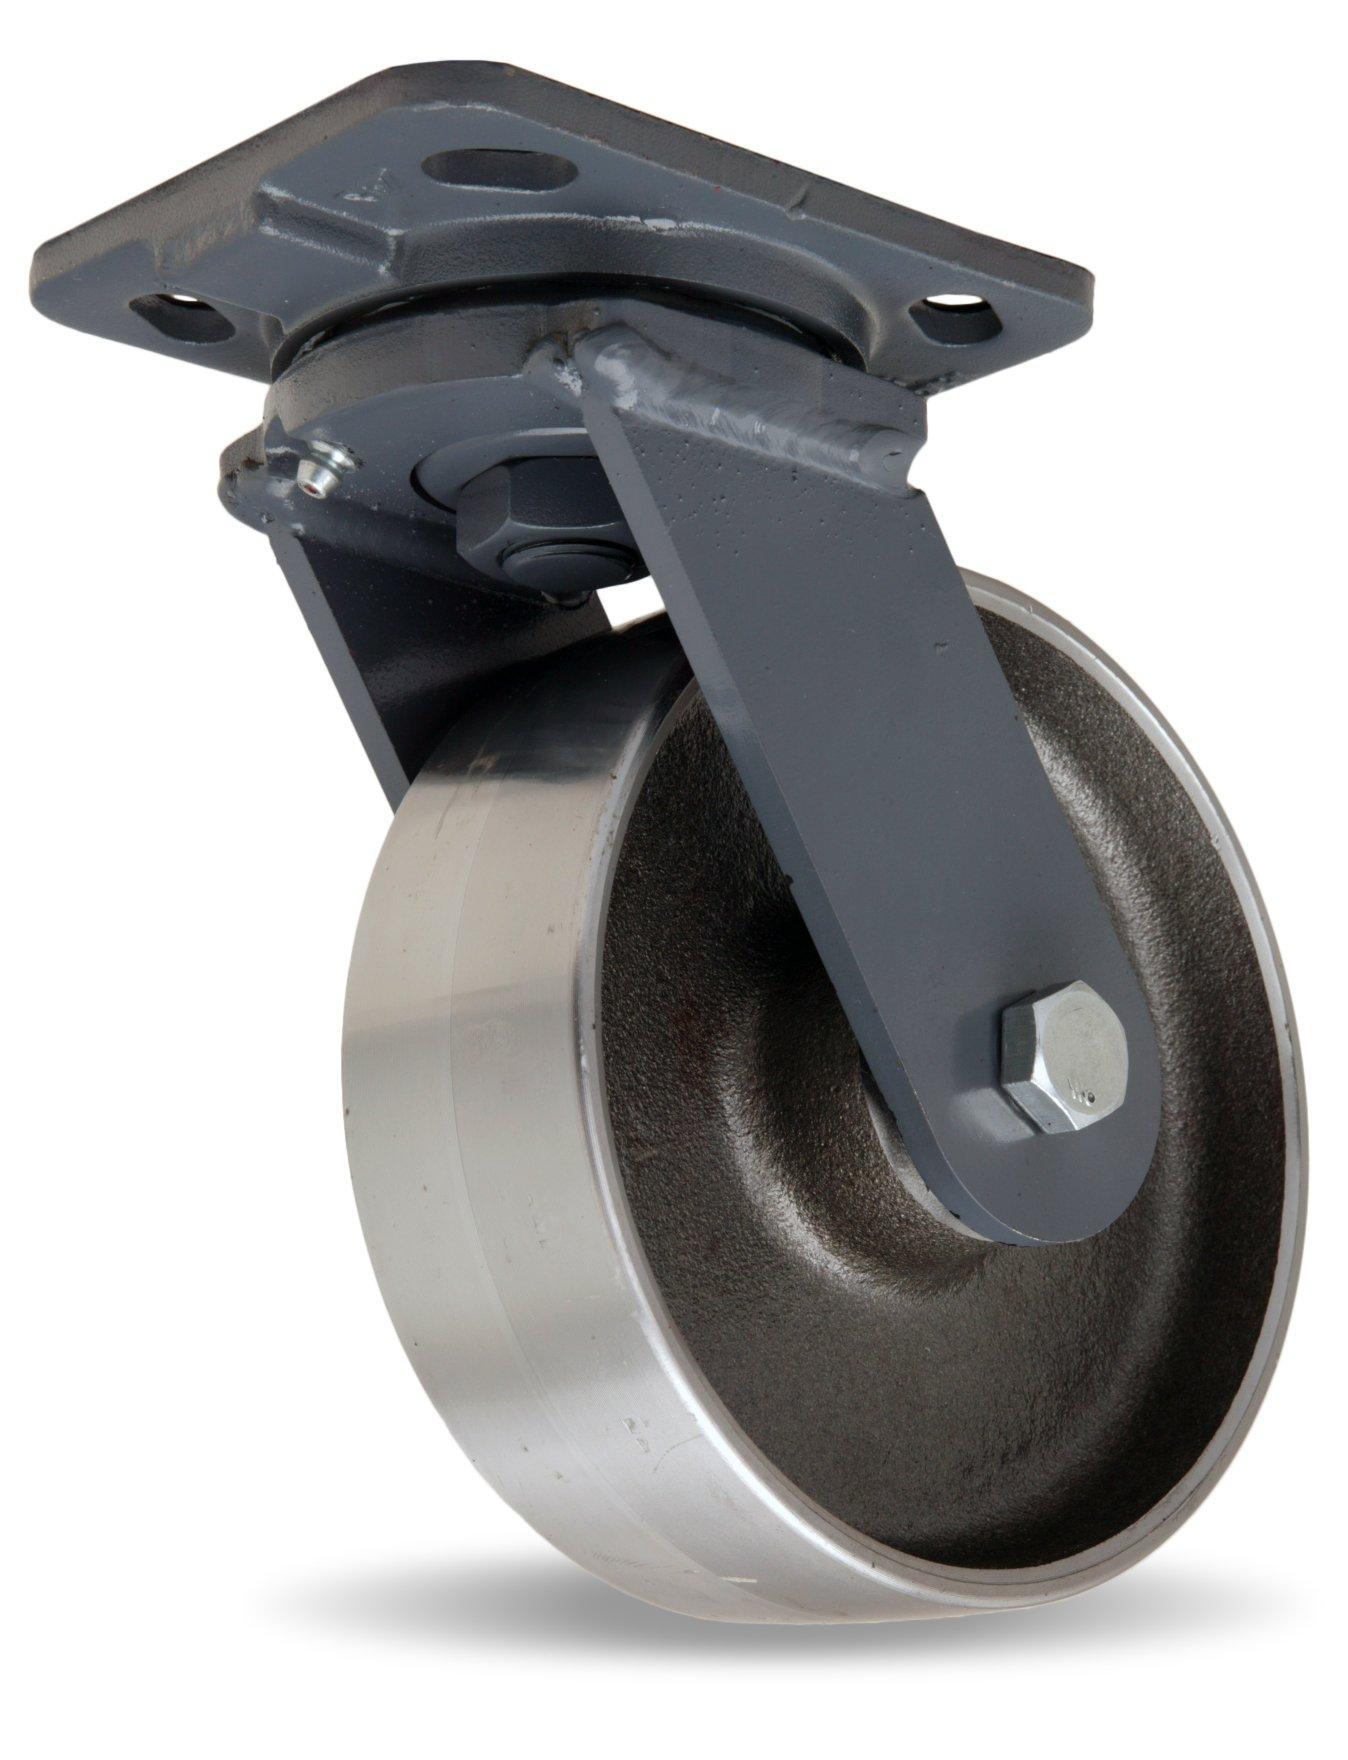 Hamilton Workhorse Plate Caster, Swivel, Steel Wheel, Precision Ball Bearing, 2000 lbs Capacity, 6'' Wheel Dia, 2'' Wheel Width, 7-1/2'' Mount Height, 5'' Plate Length, 4'' Plate Width